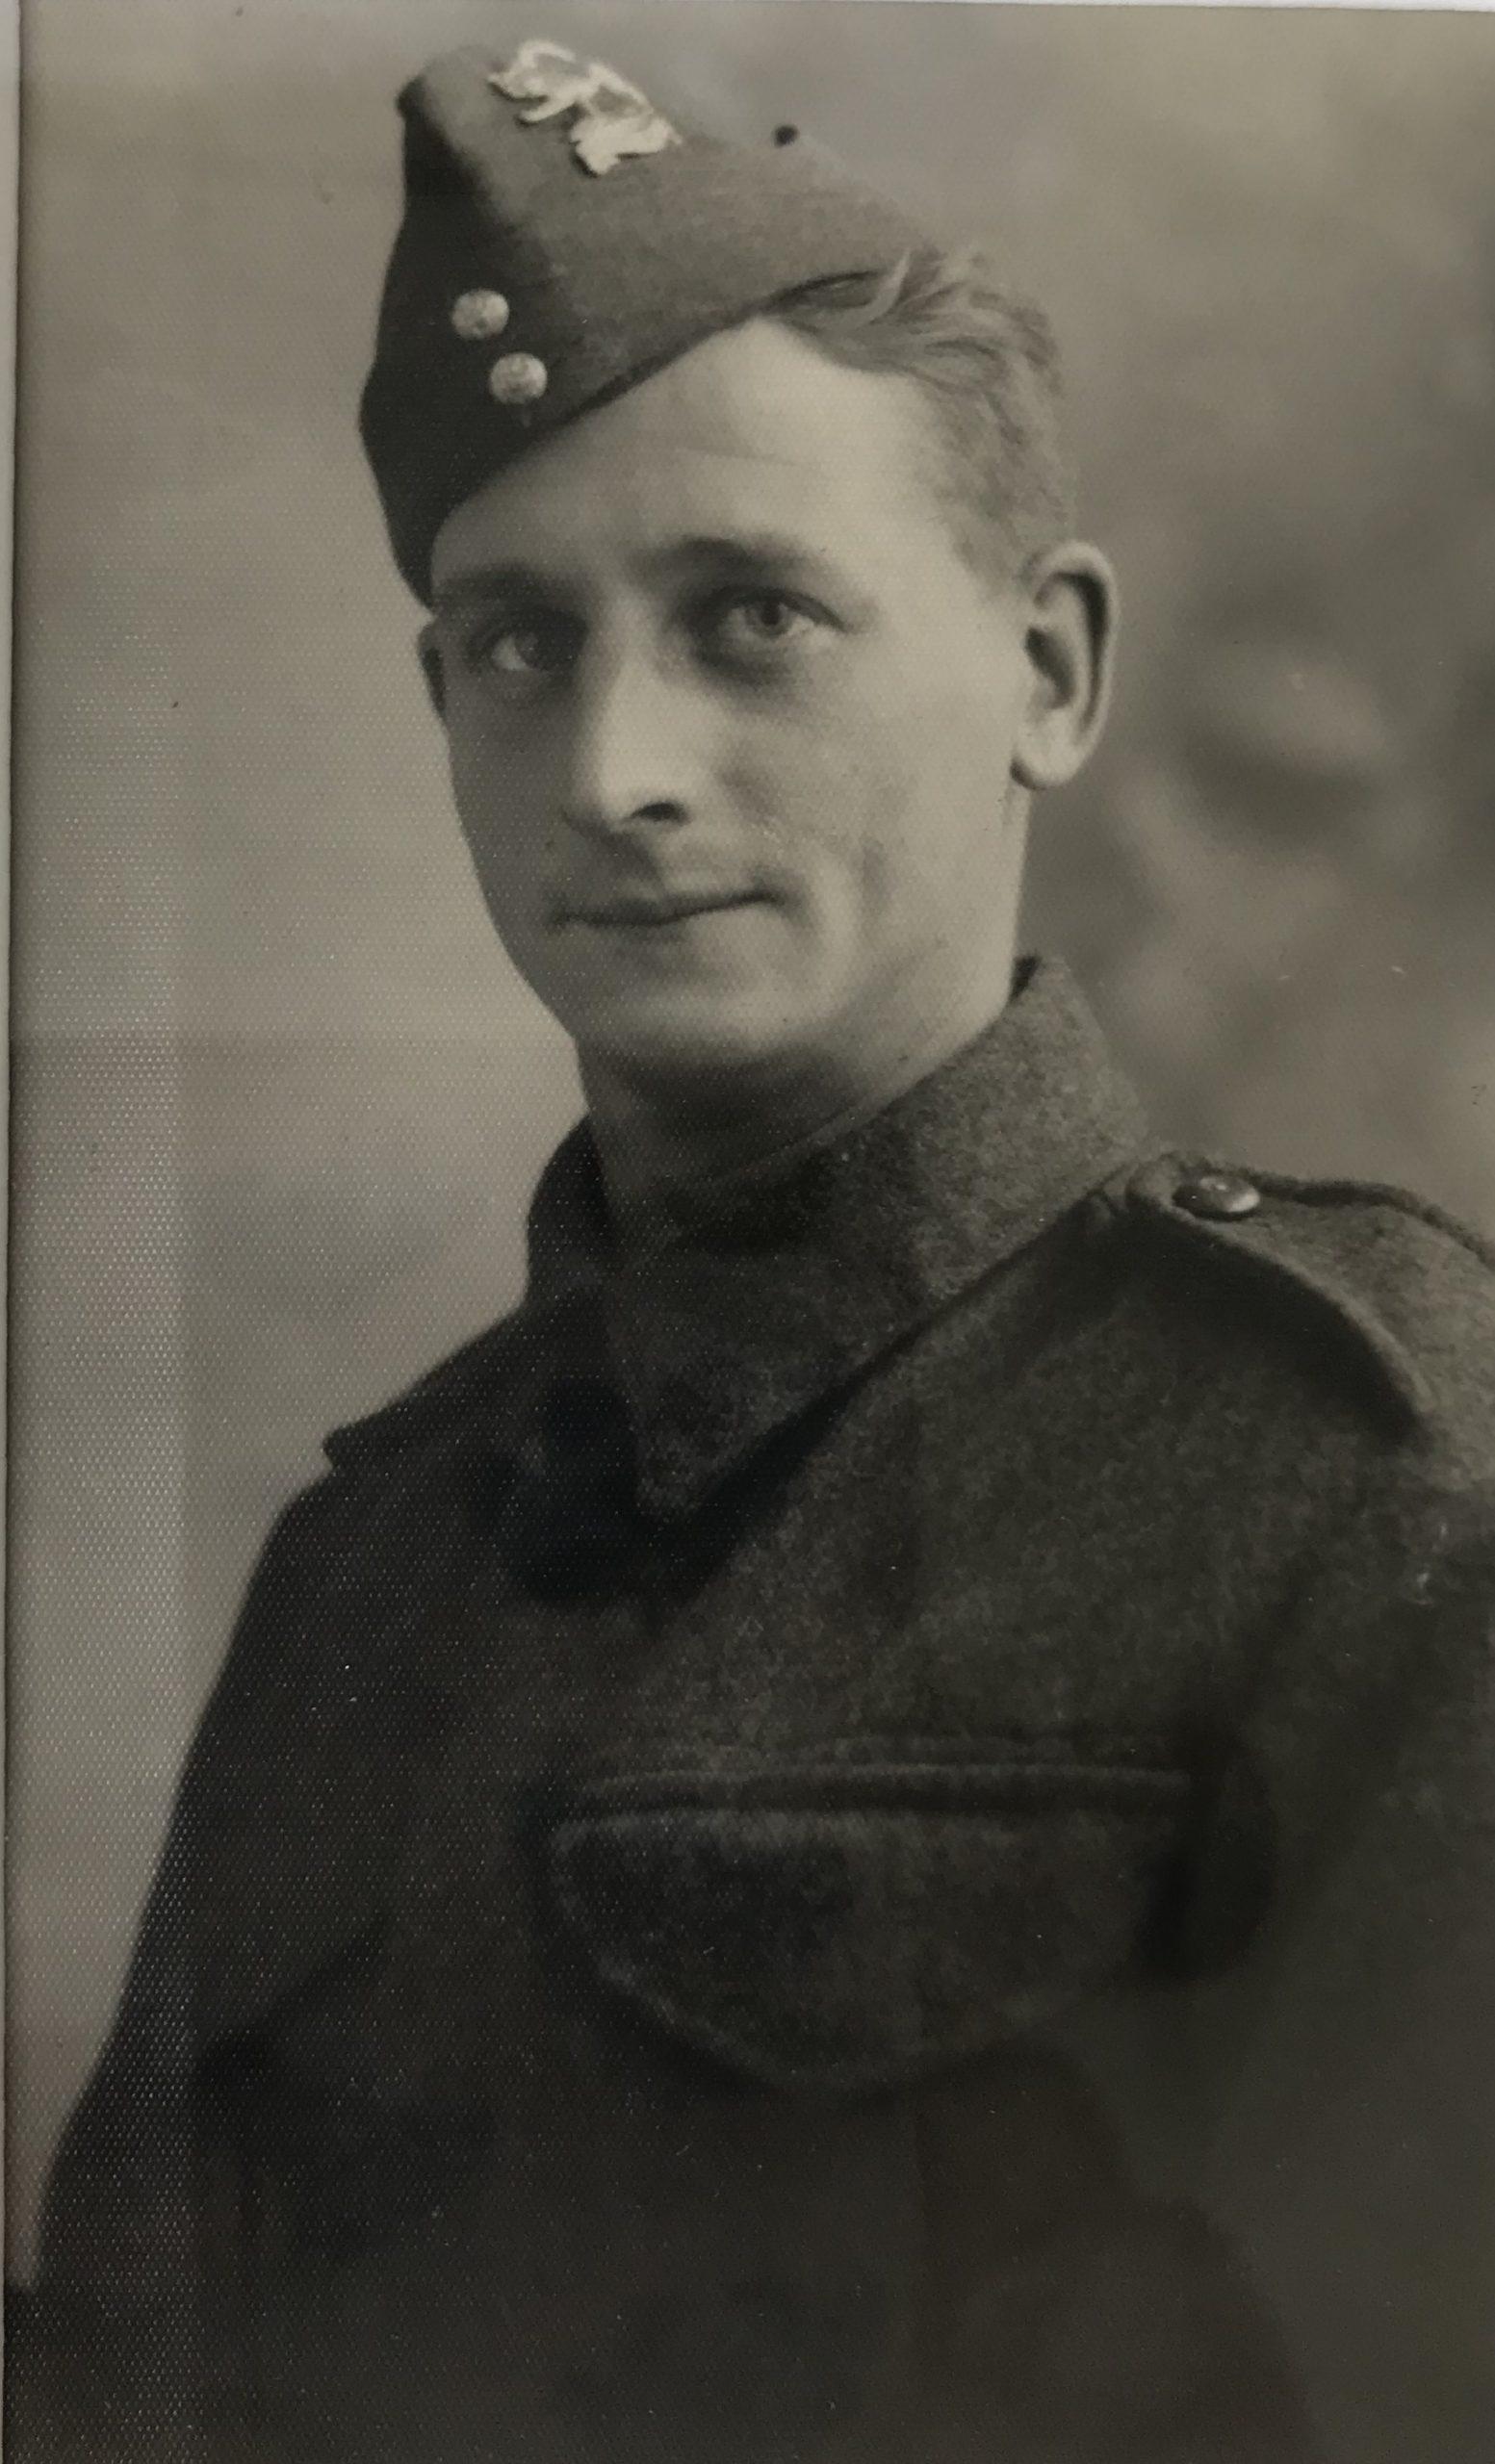 Gordon Hill in WW2